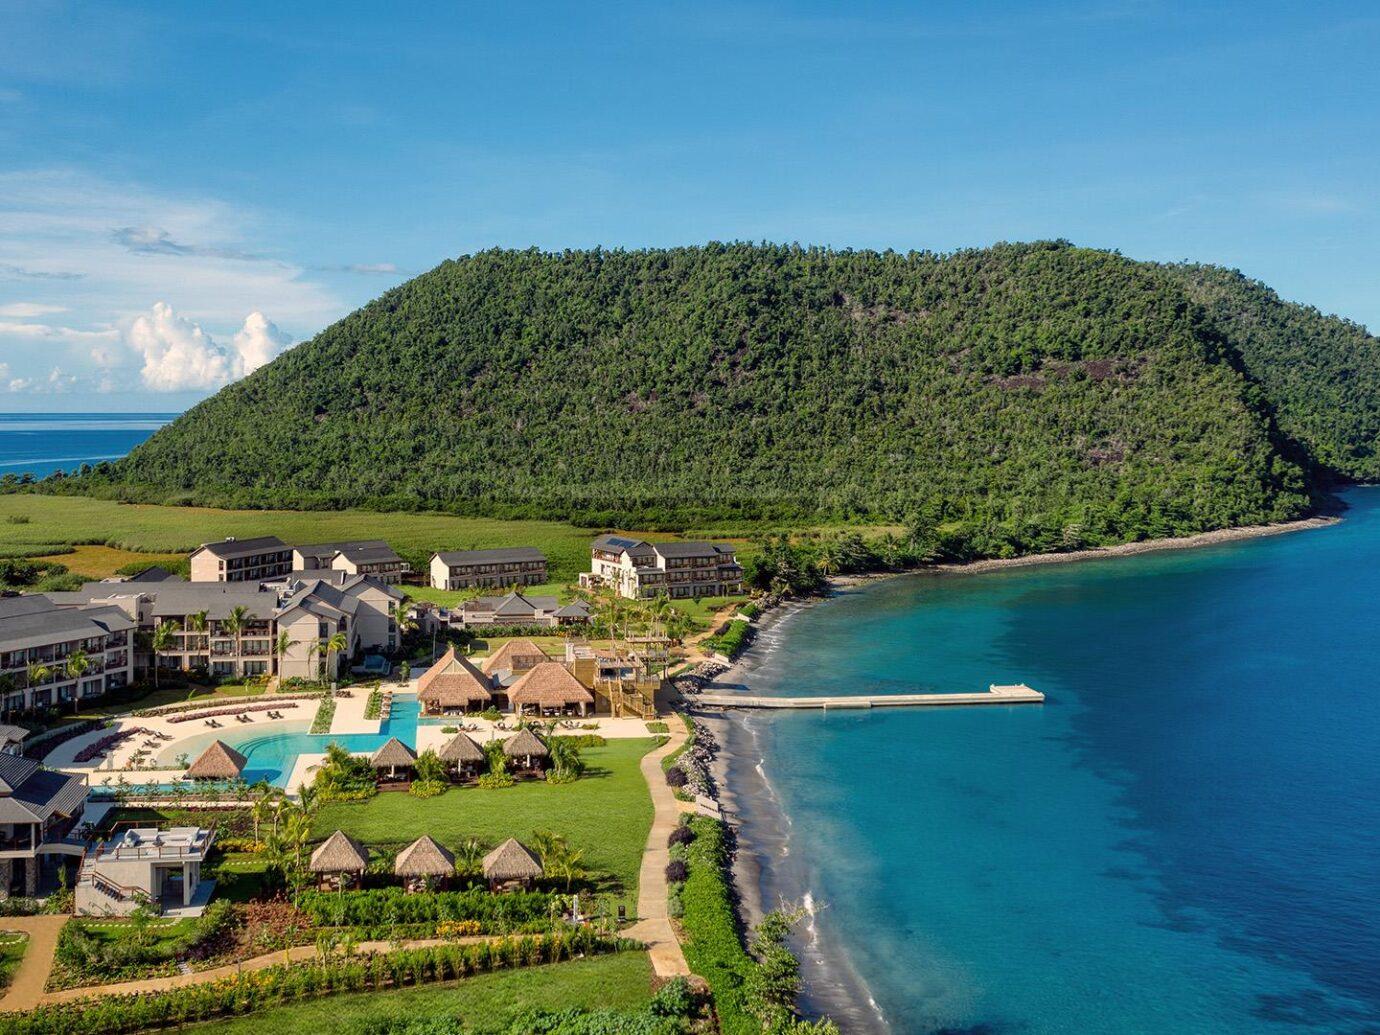 Aerial view of Cabrits Resort & Spa Kempinski